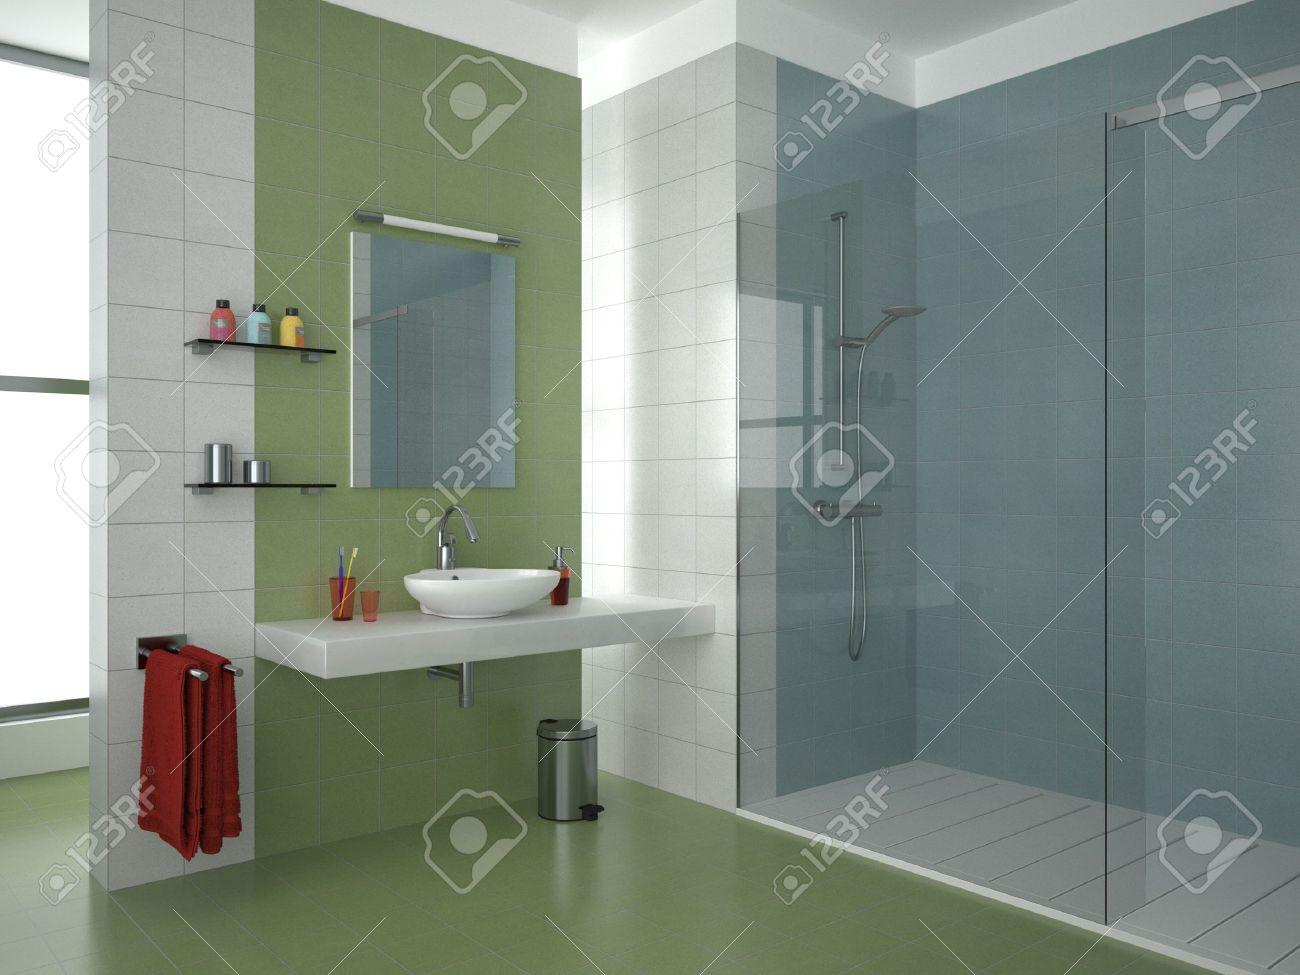 badezimmer blau | jtleigh - hausgestaltung ideen, Hause ideen